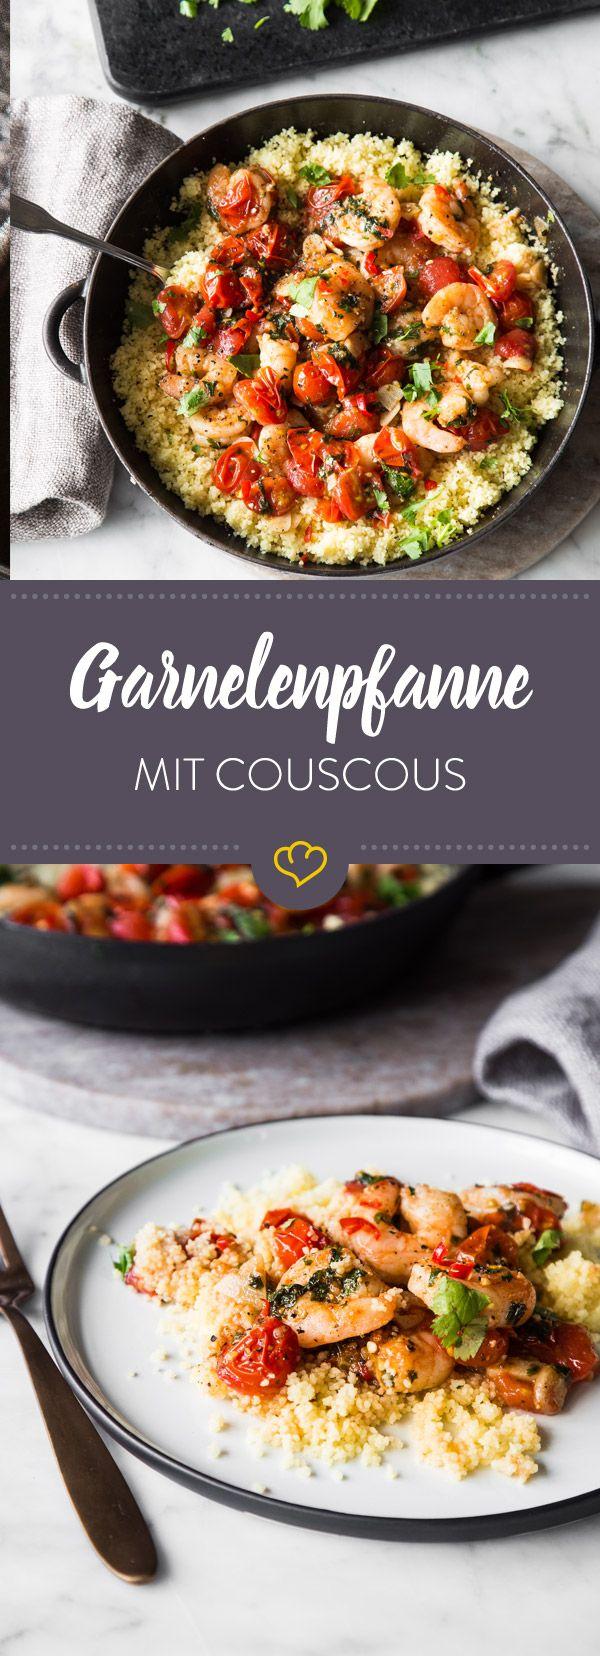 Photo of Quick shrimp pan with couscous